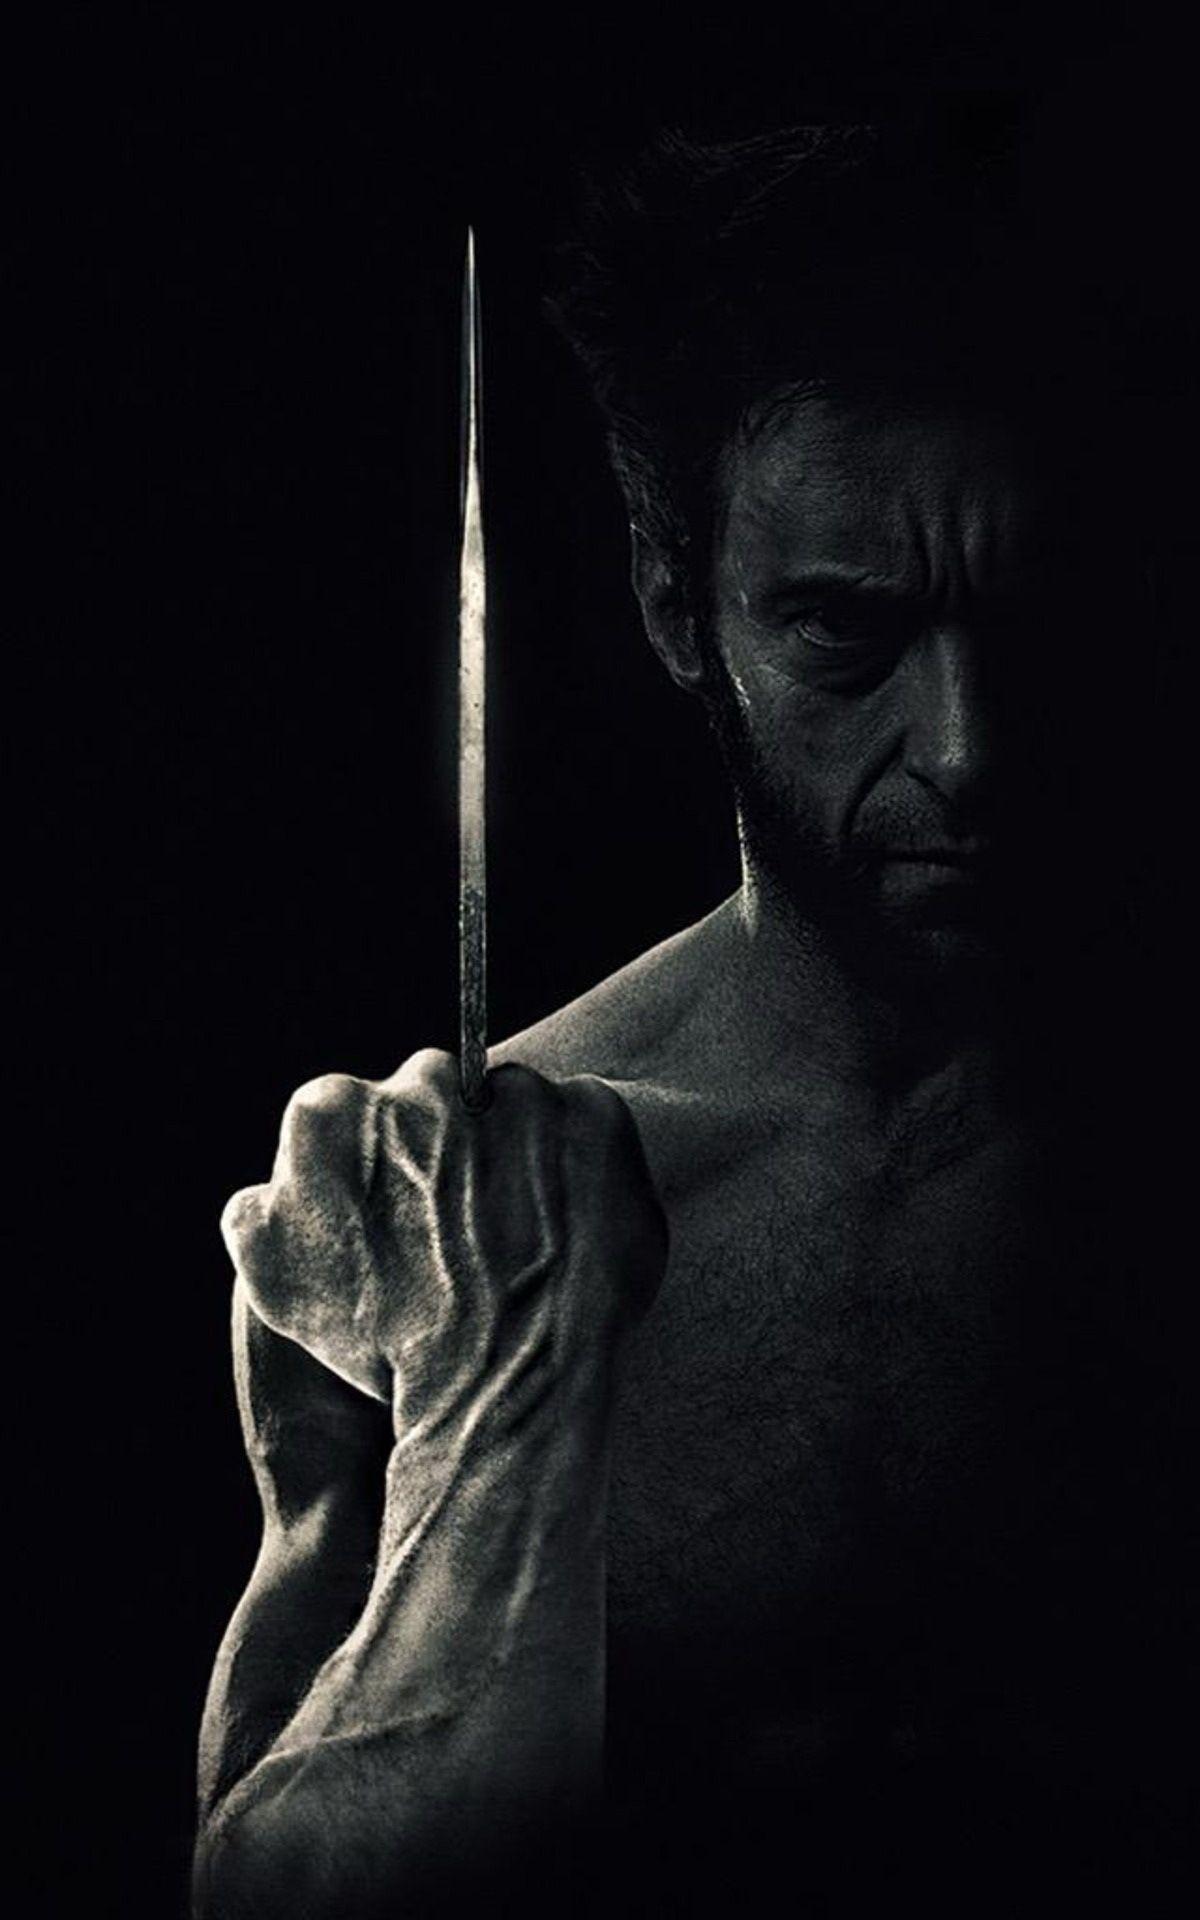 Wallpaper iphone 6 xman - Xmen Wolverine Hugh Jackman Iphone 6 Wallpaper Hd Back Wallpapers